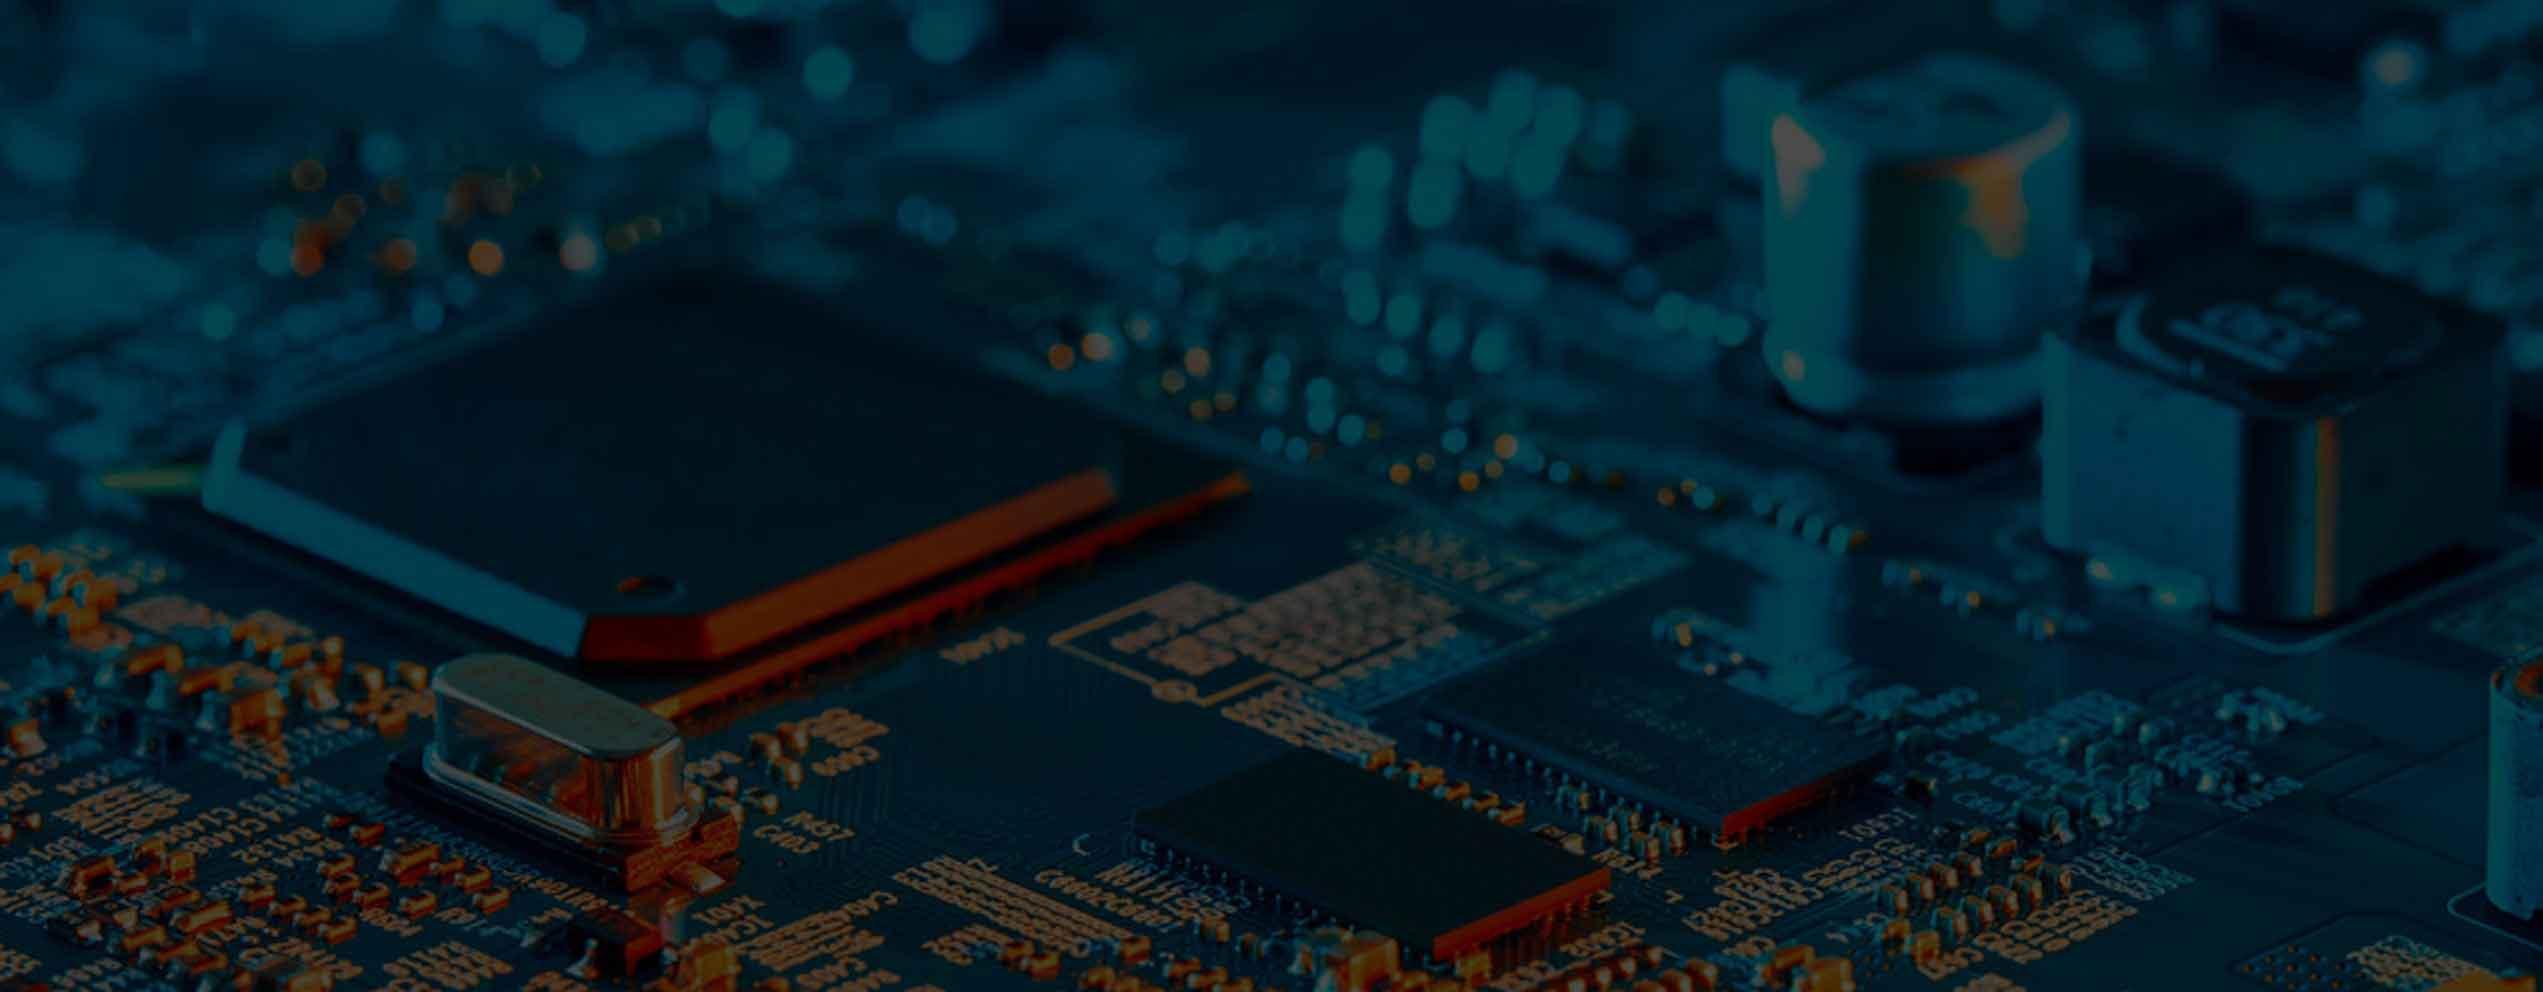 SFX PCB Web Background